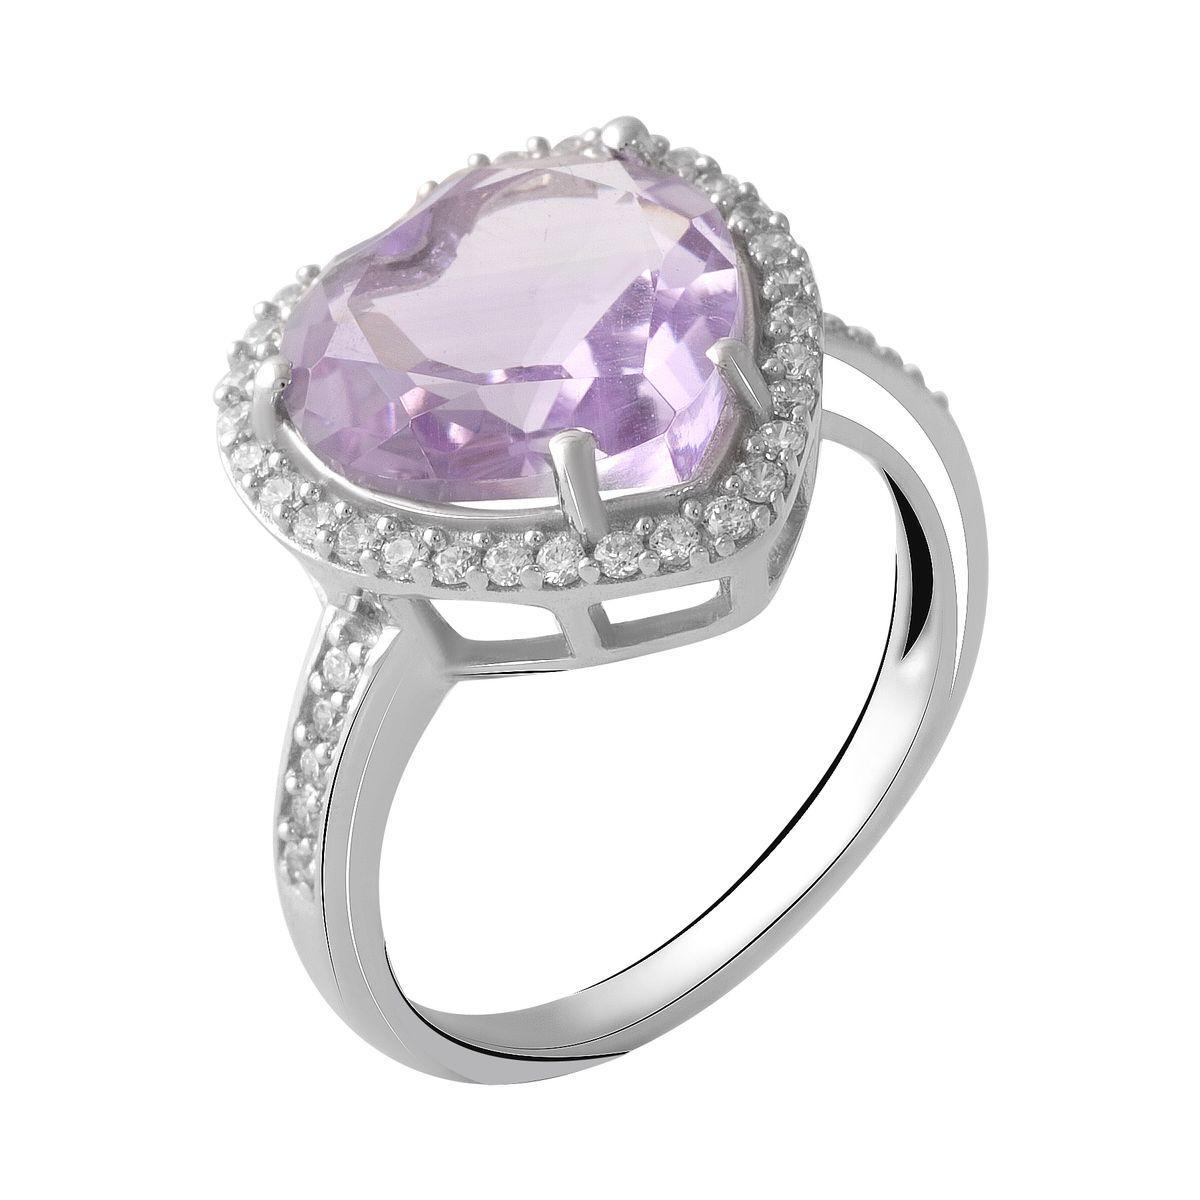 Серебряное кольцо DreamJewelry с натуральным аметистом 4.58ct (2048756) 18 размер